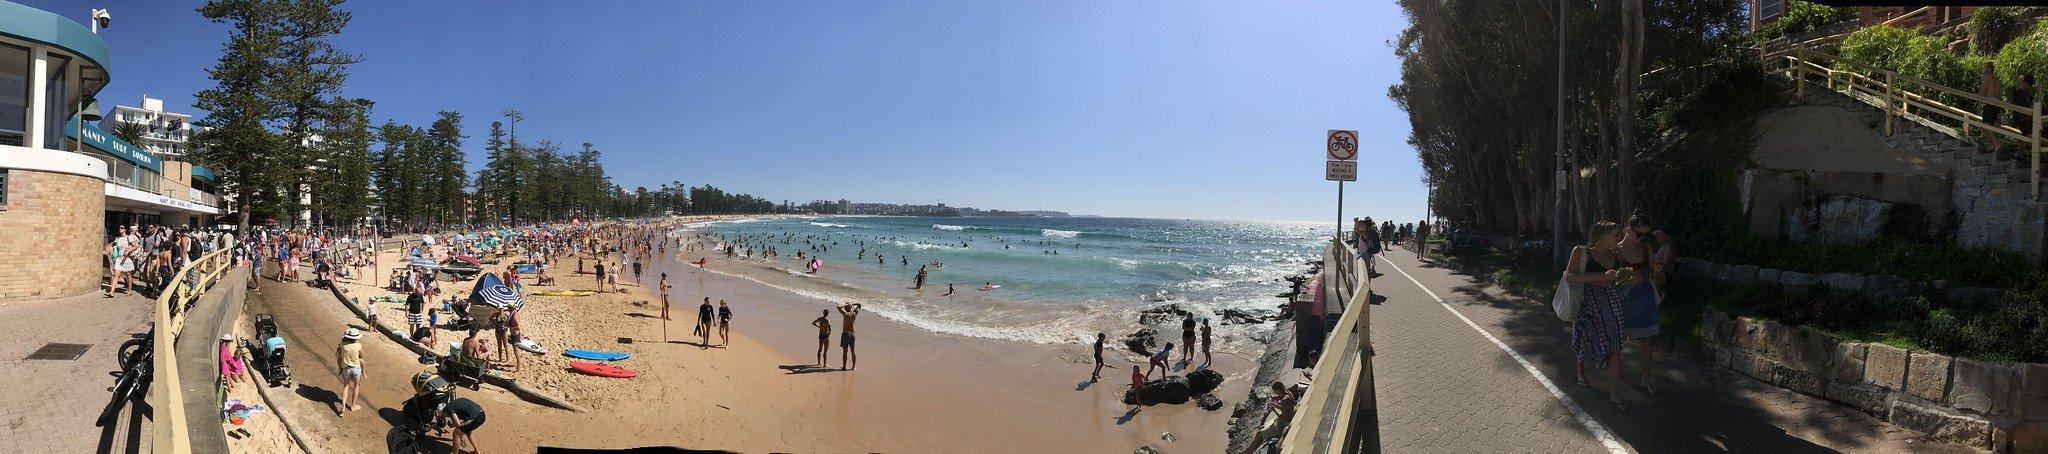 Manly Beach, Best Beaches in Australia